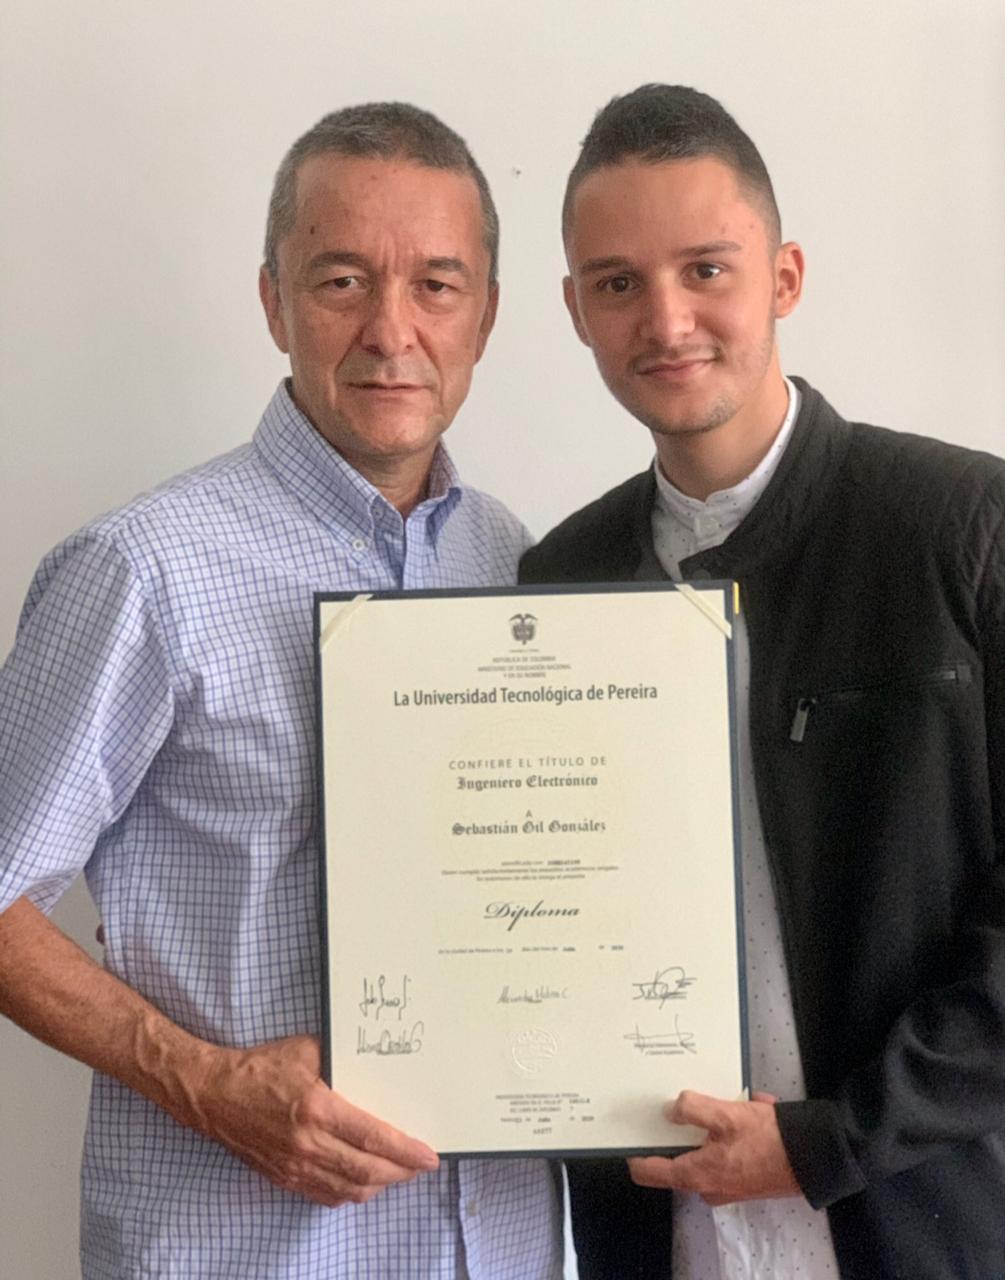 Sebastián Gil González se graduó como Ingeniero Electrónico